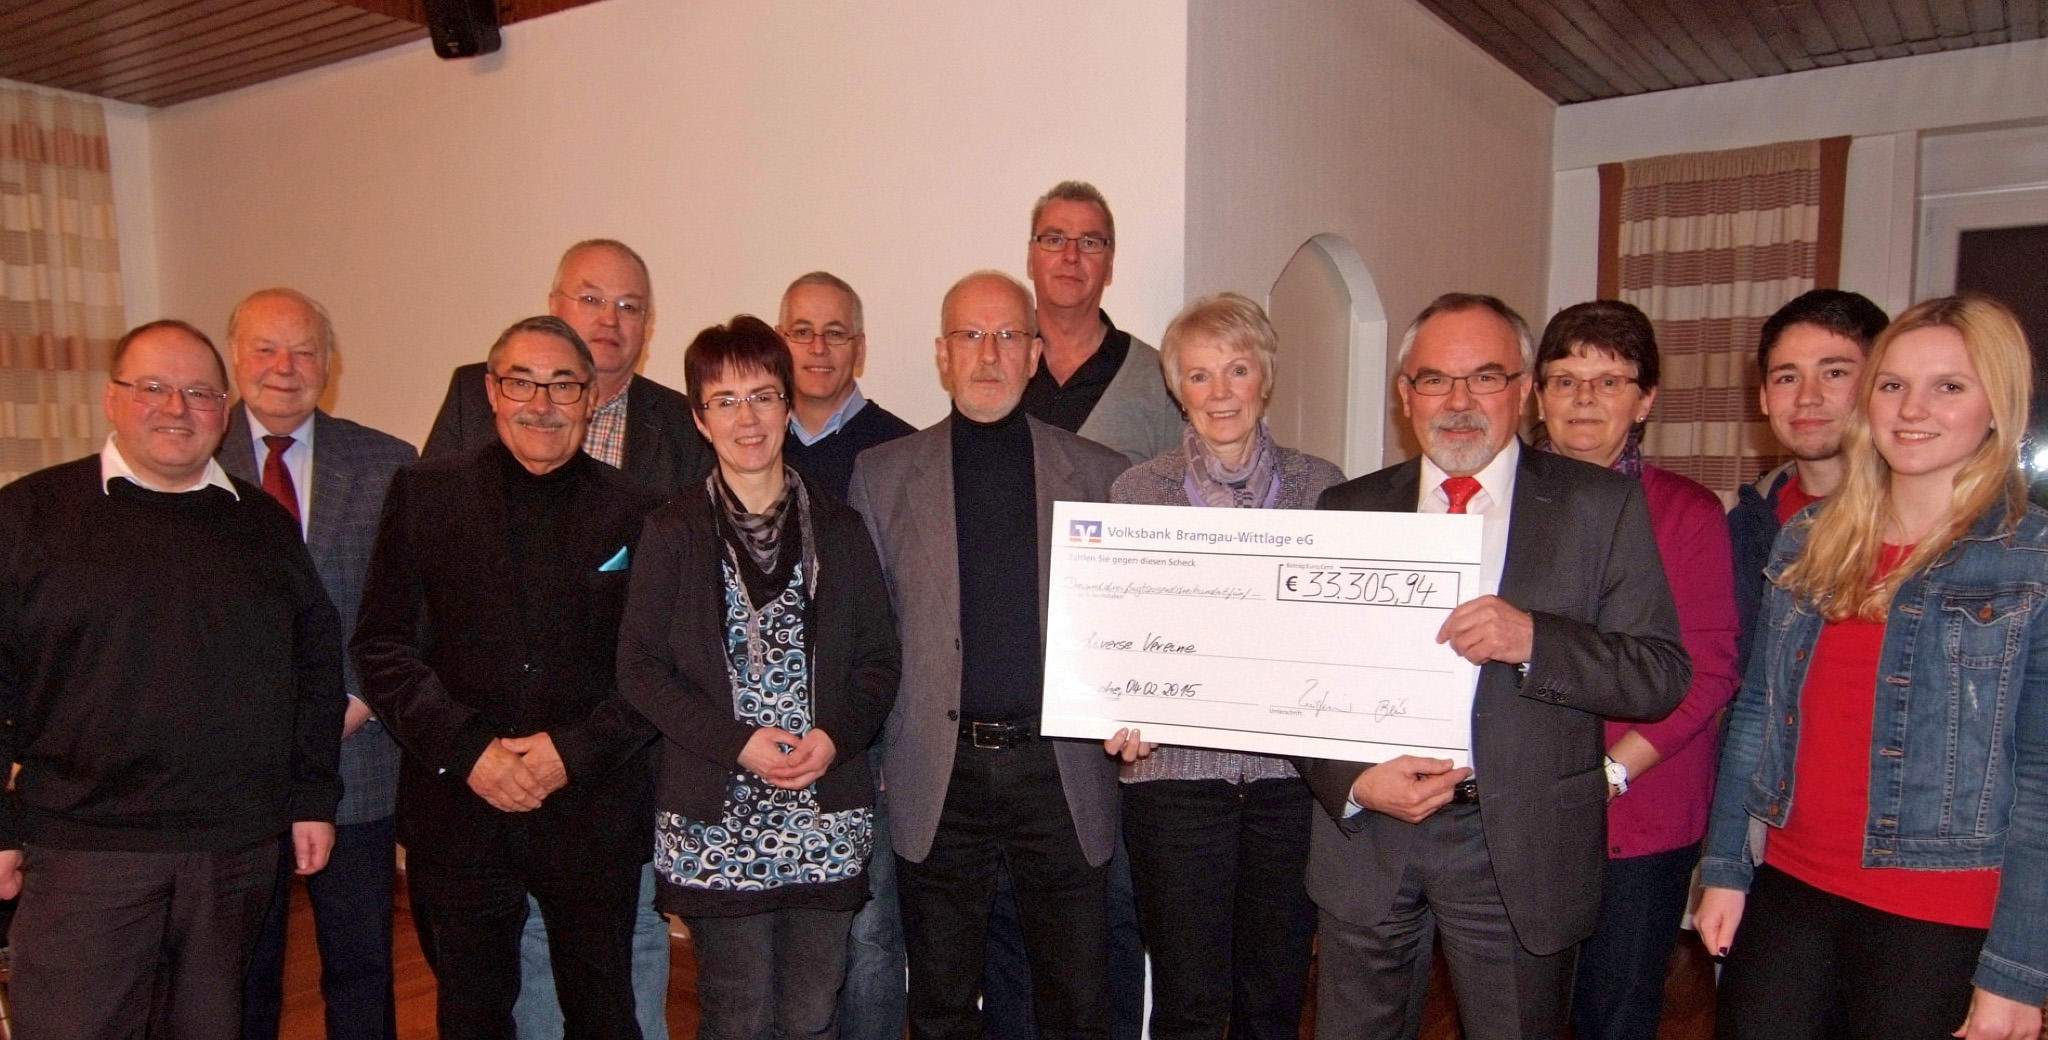 Jochen Bruhn 3.v.l. im Kreise weiterer Wallenhorster Spendenempfänger